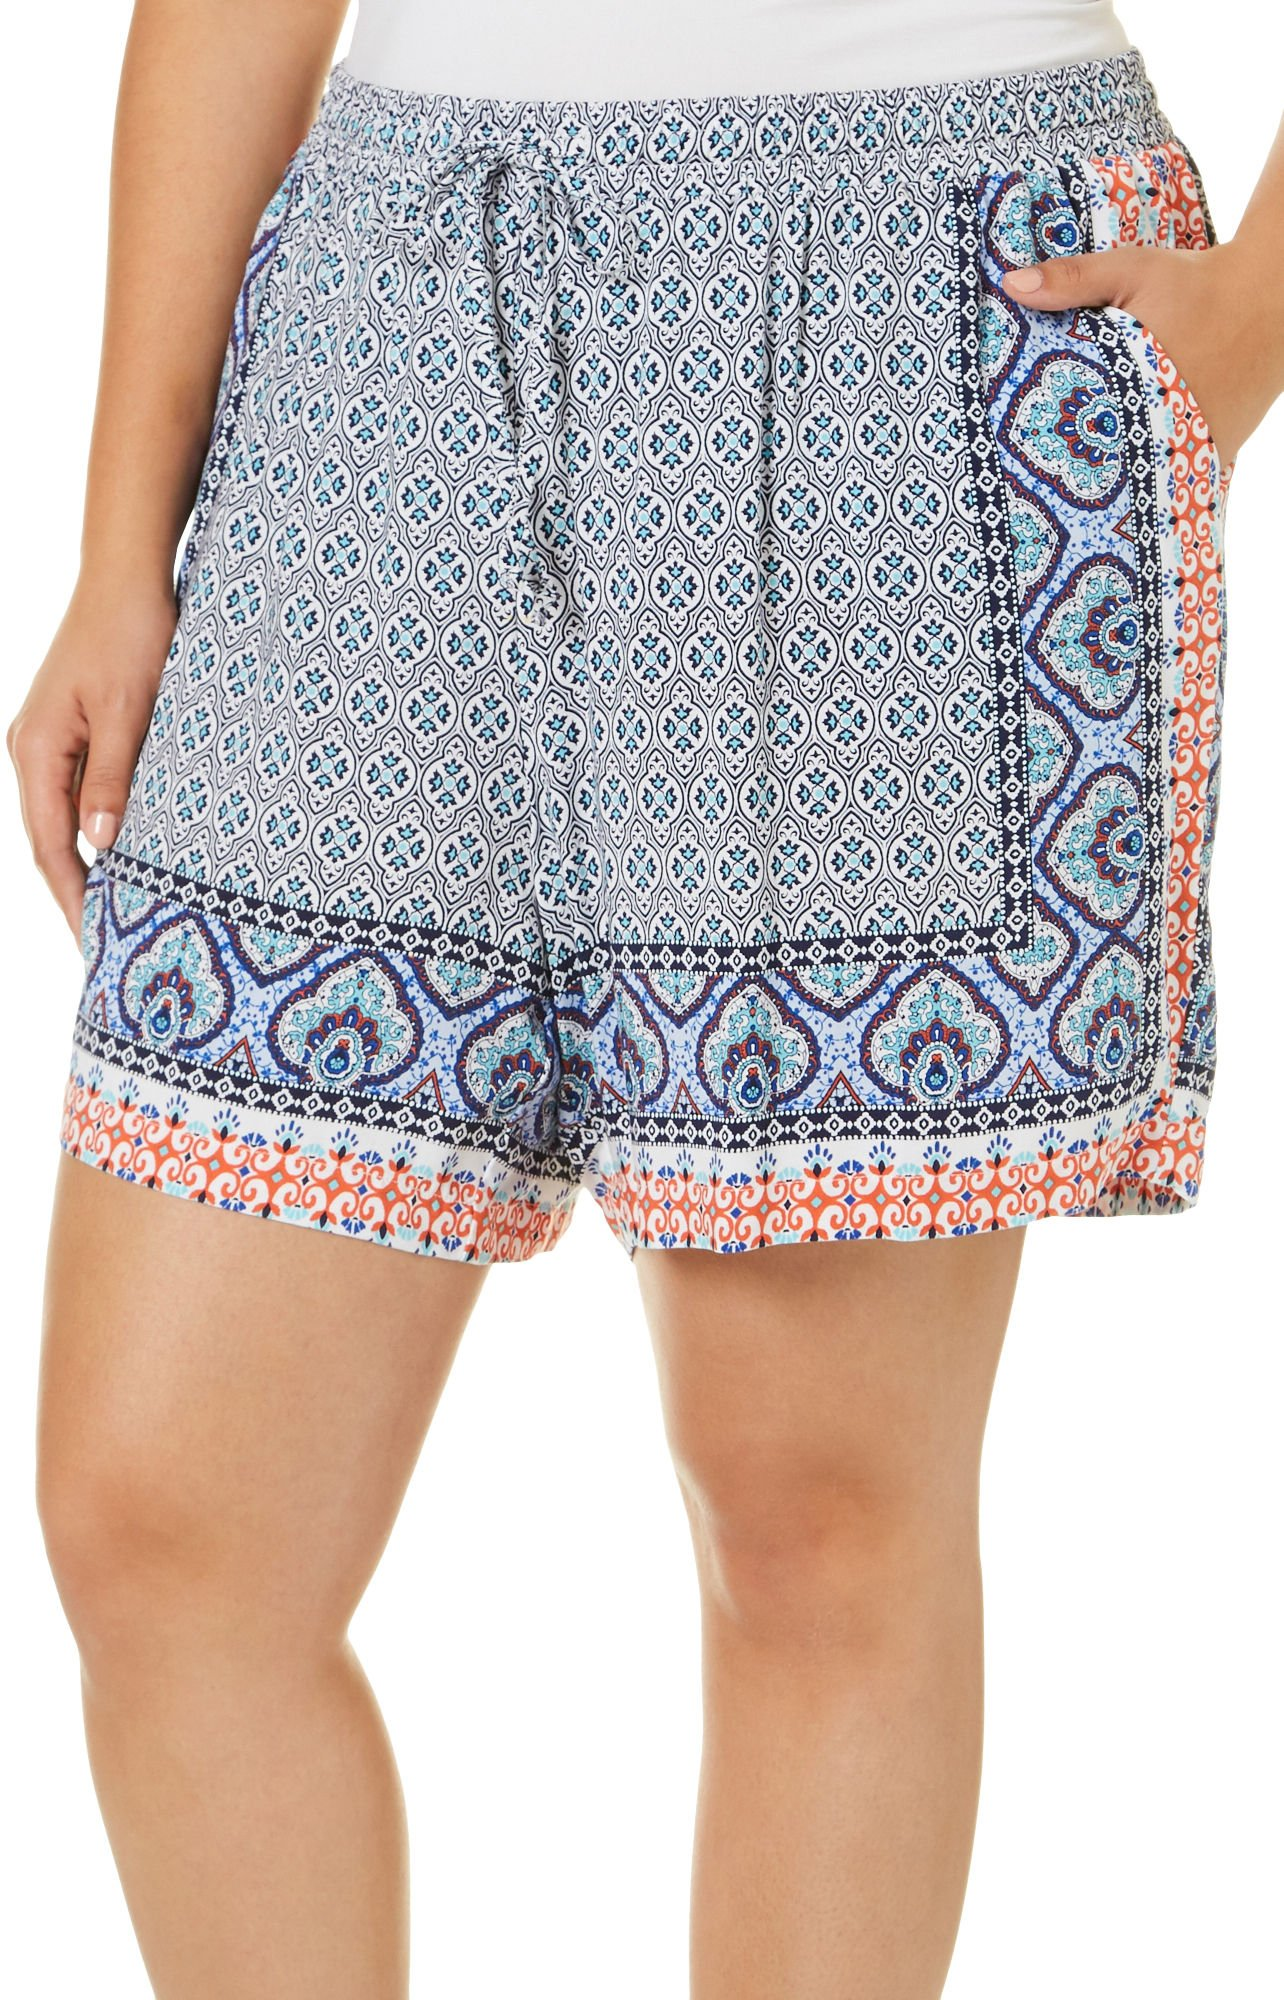 Dept 222 Plus Blue Daze Tile Print Shorts 1X Blue/Orange/White